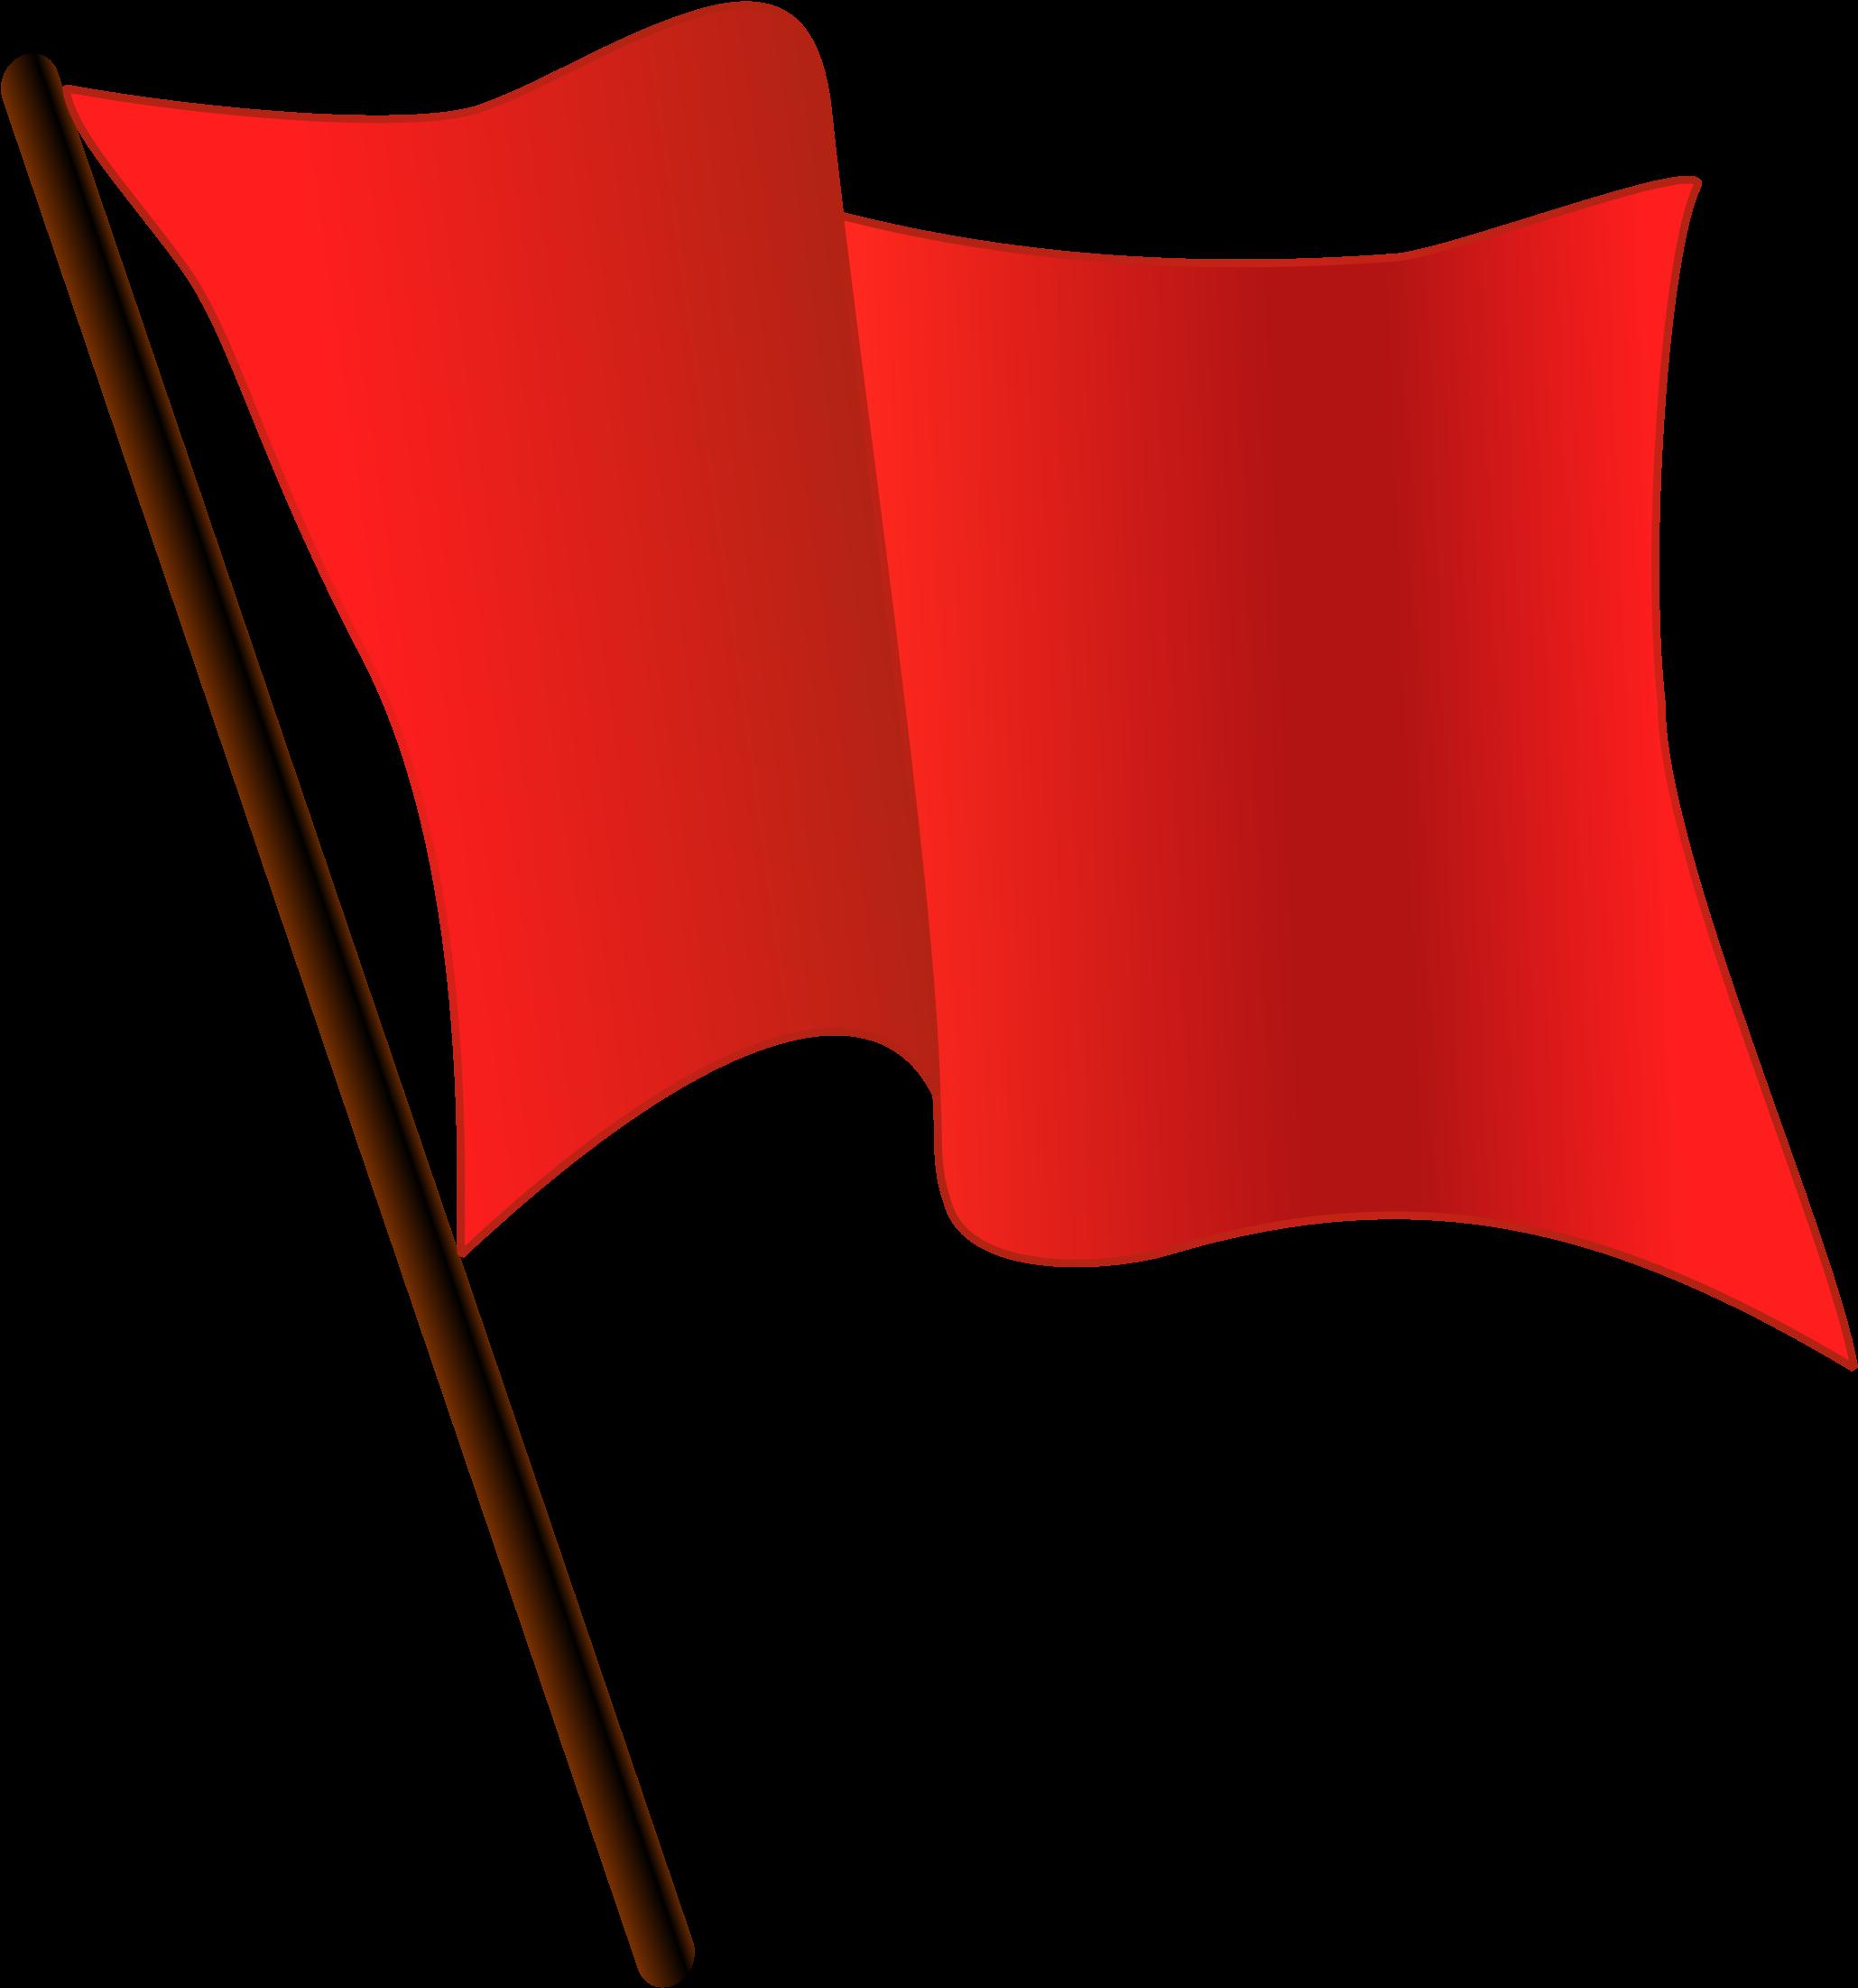 Clip Art Christian Flag Clip Art.